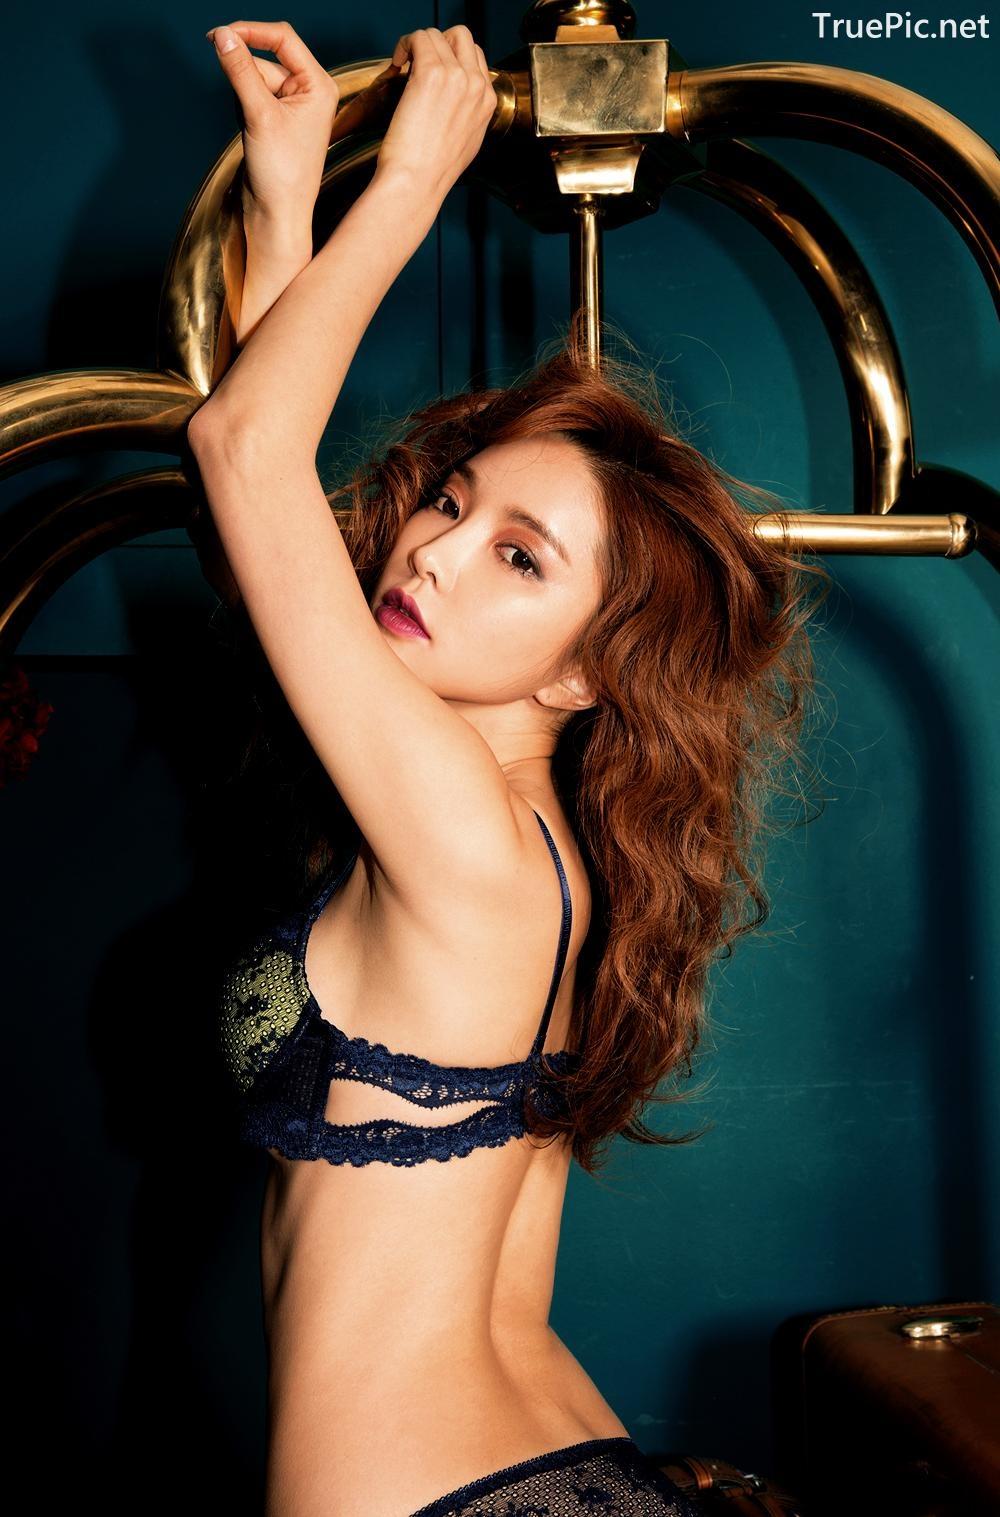 Image Korean Fashion Model - Park Soo Yeon - BVB Black Lace Lingerie - TruePic.net - Picture-4